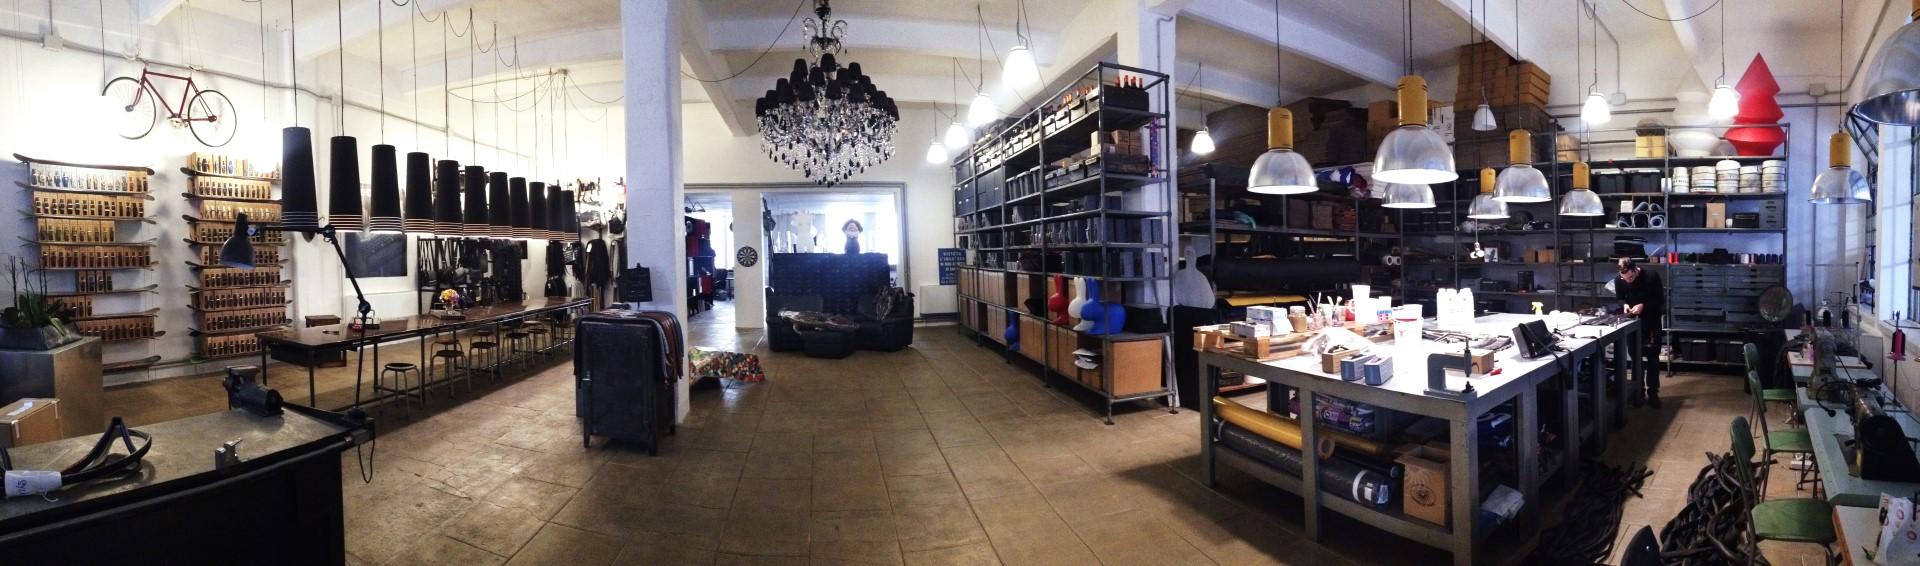 laboratorio grandangolo.jpg